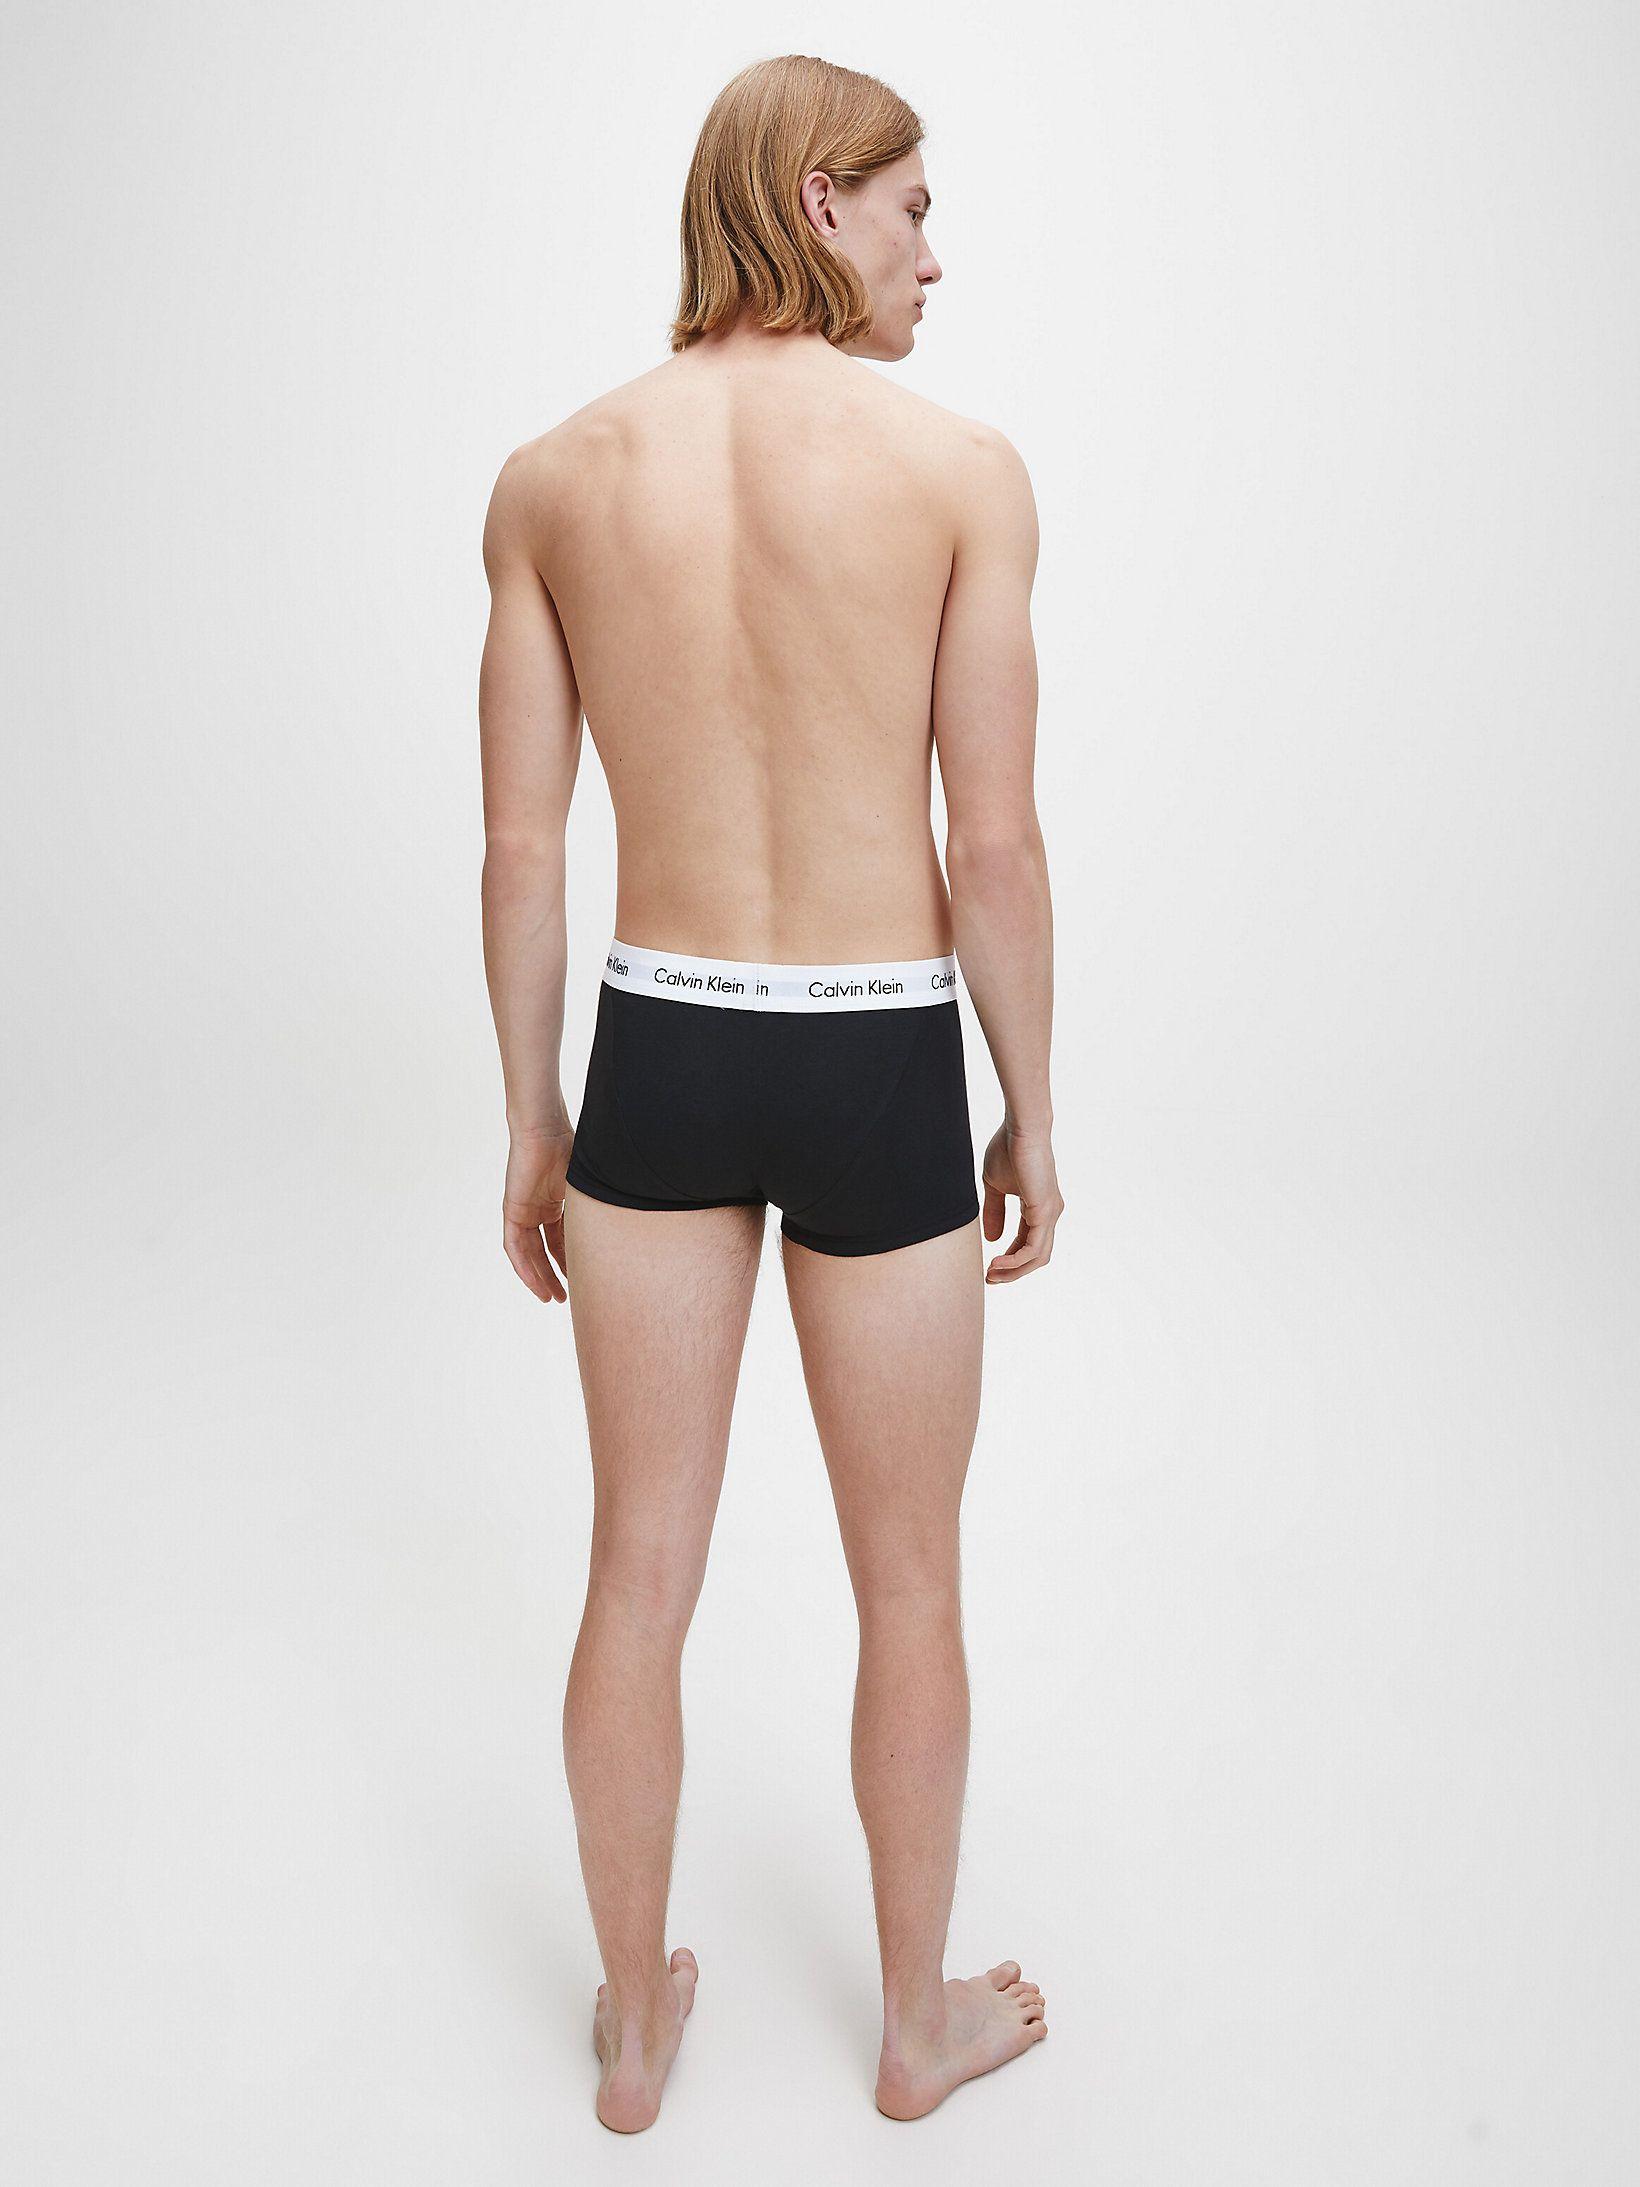 Calvin Klein 3 Pack Trunks - Low Rise - Cotton Stretch, Black